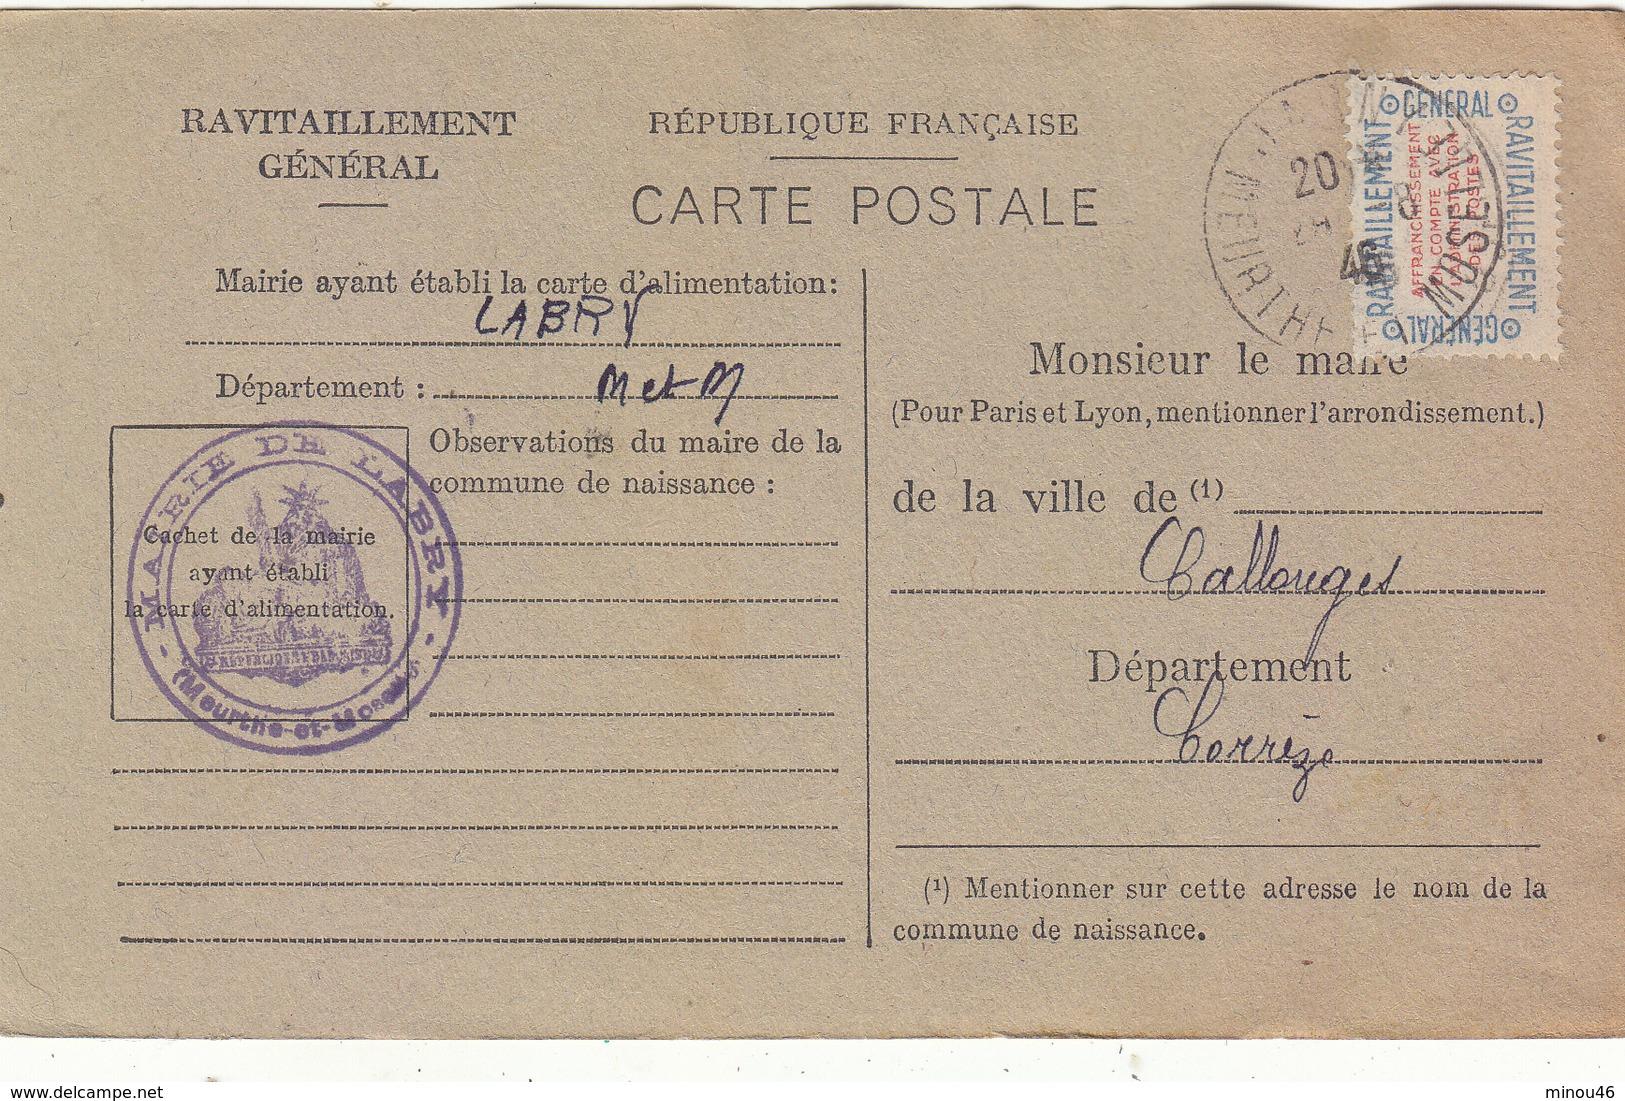 LABRY : CARTE DE RAVITAILLEMENT GENERAL.TIMBREE. NON OBLITEREE.1946.T.B.ETAT.A SAISIR.PETIT PRIX. - Other Municipalities